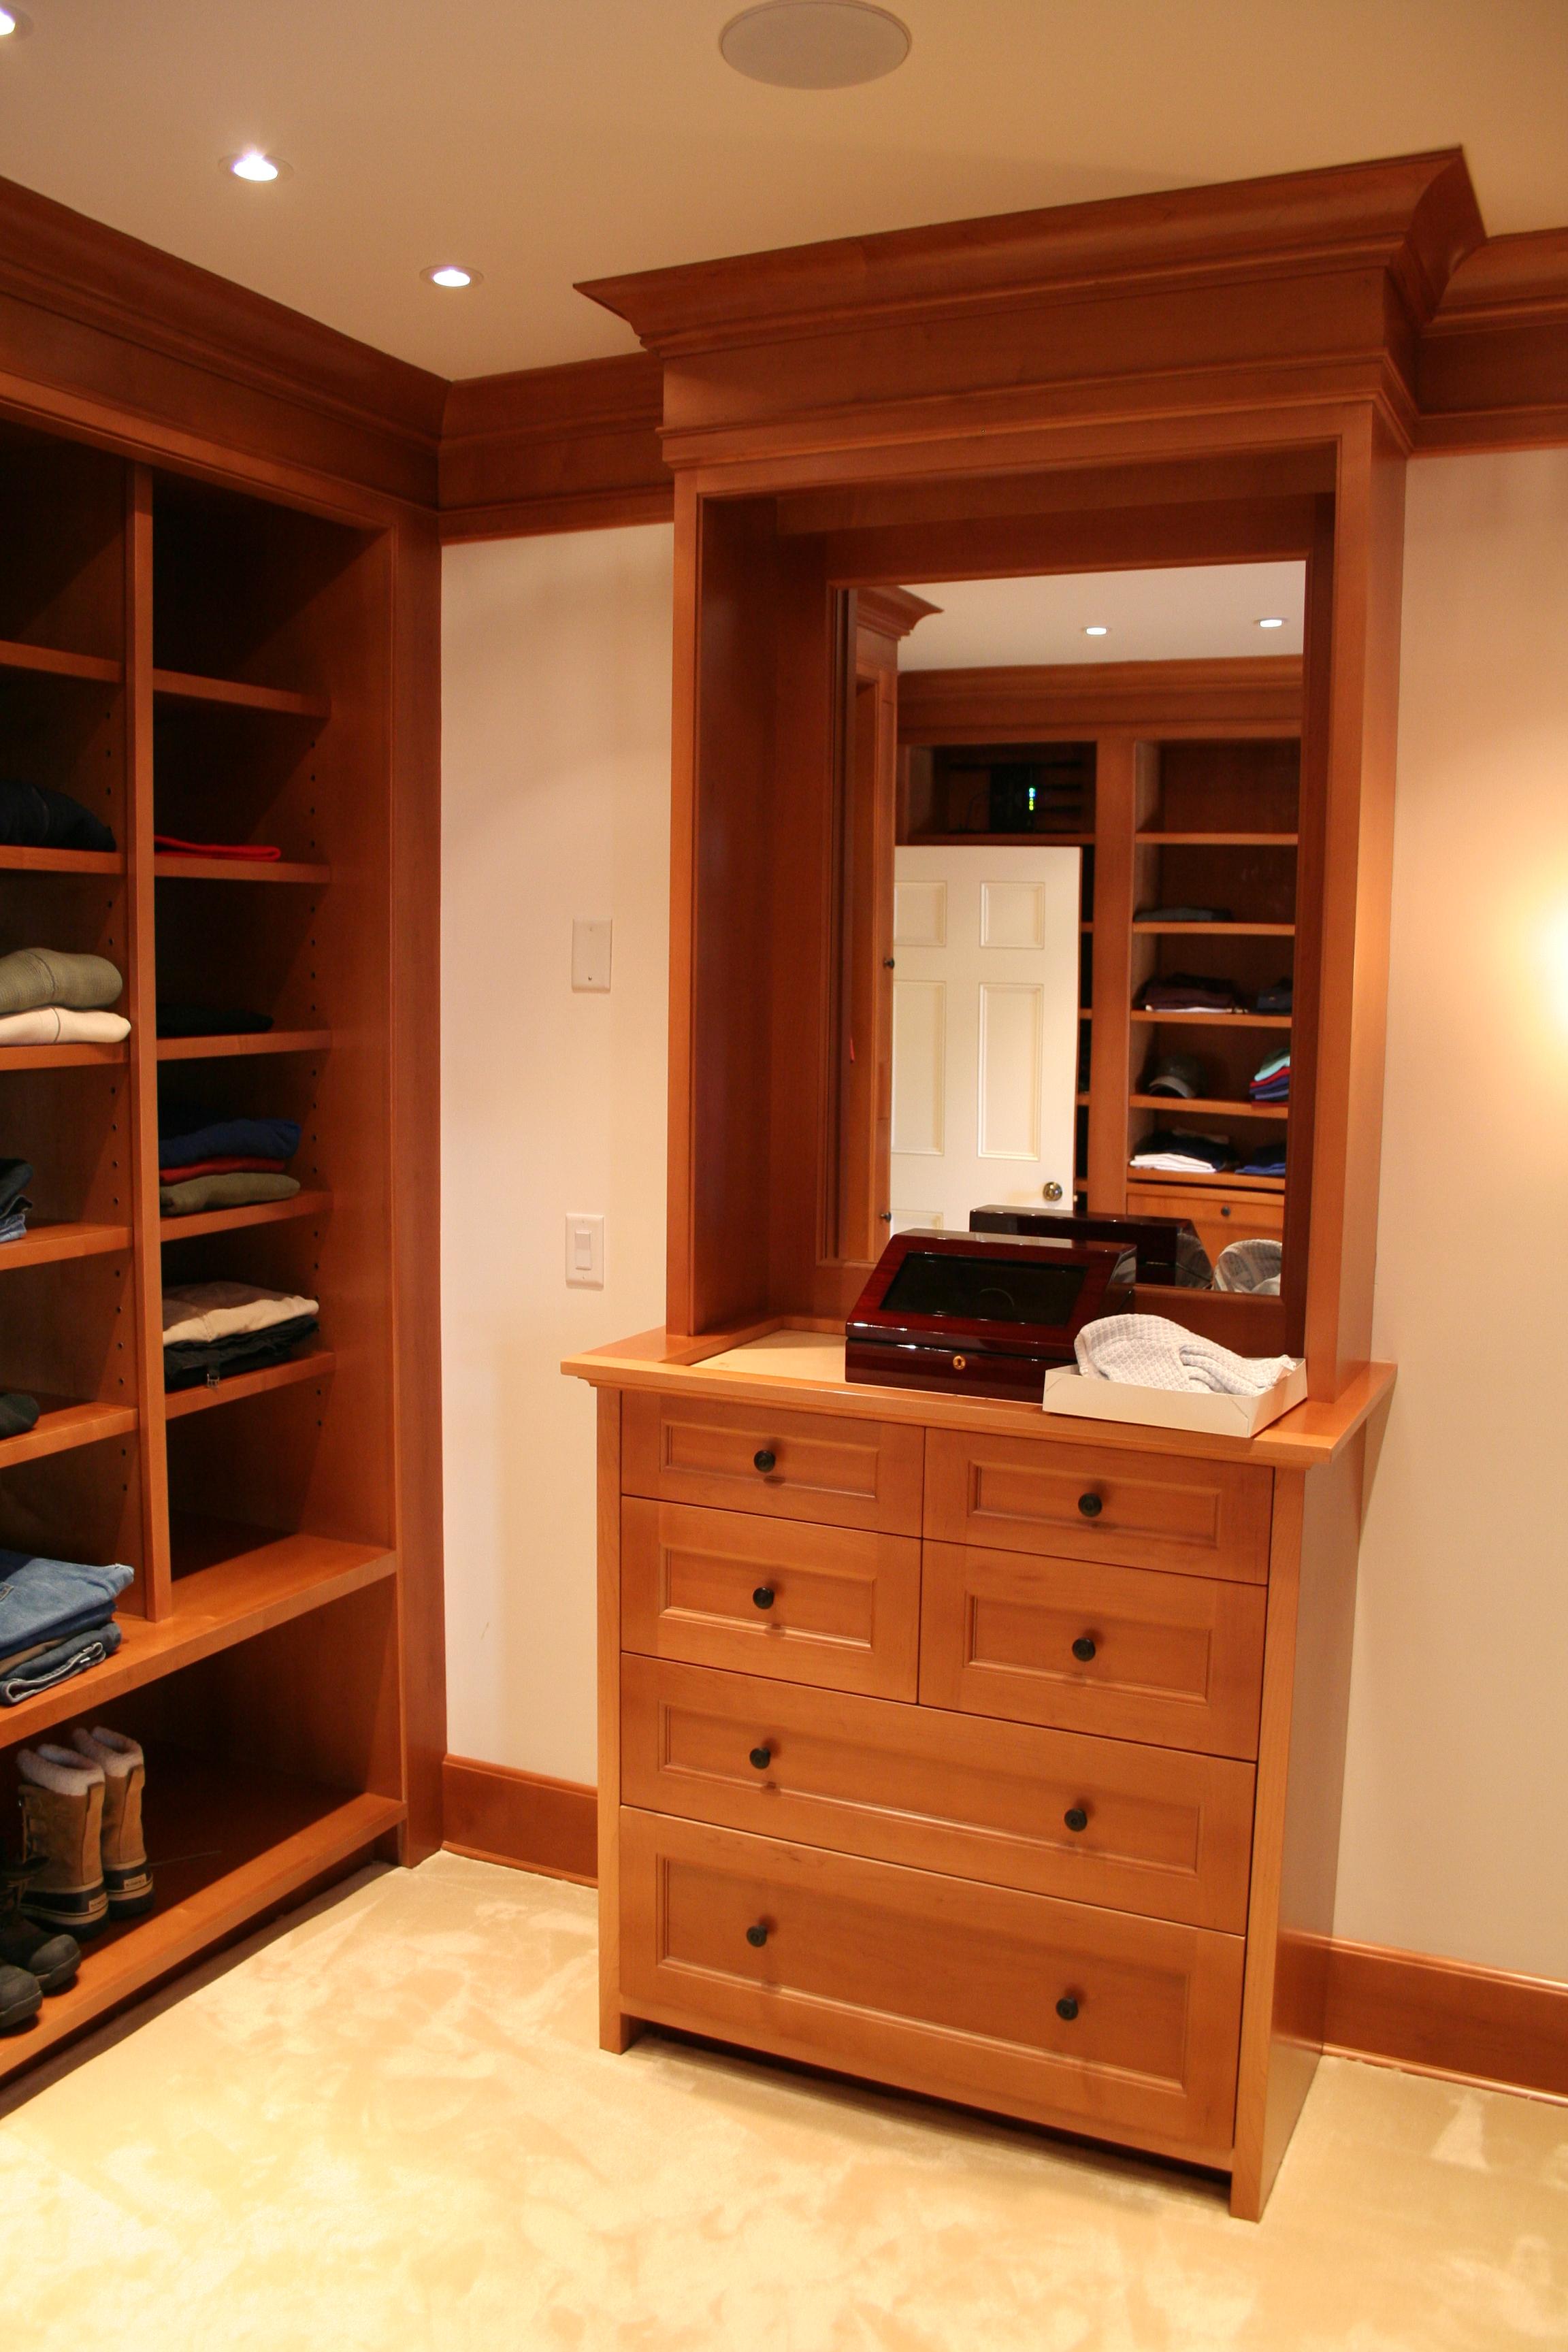 Bonadio, Wadia, closets 9-2012 001.JPG